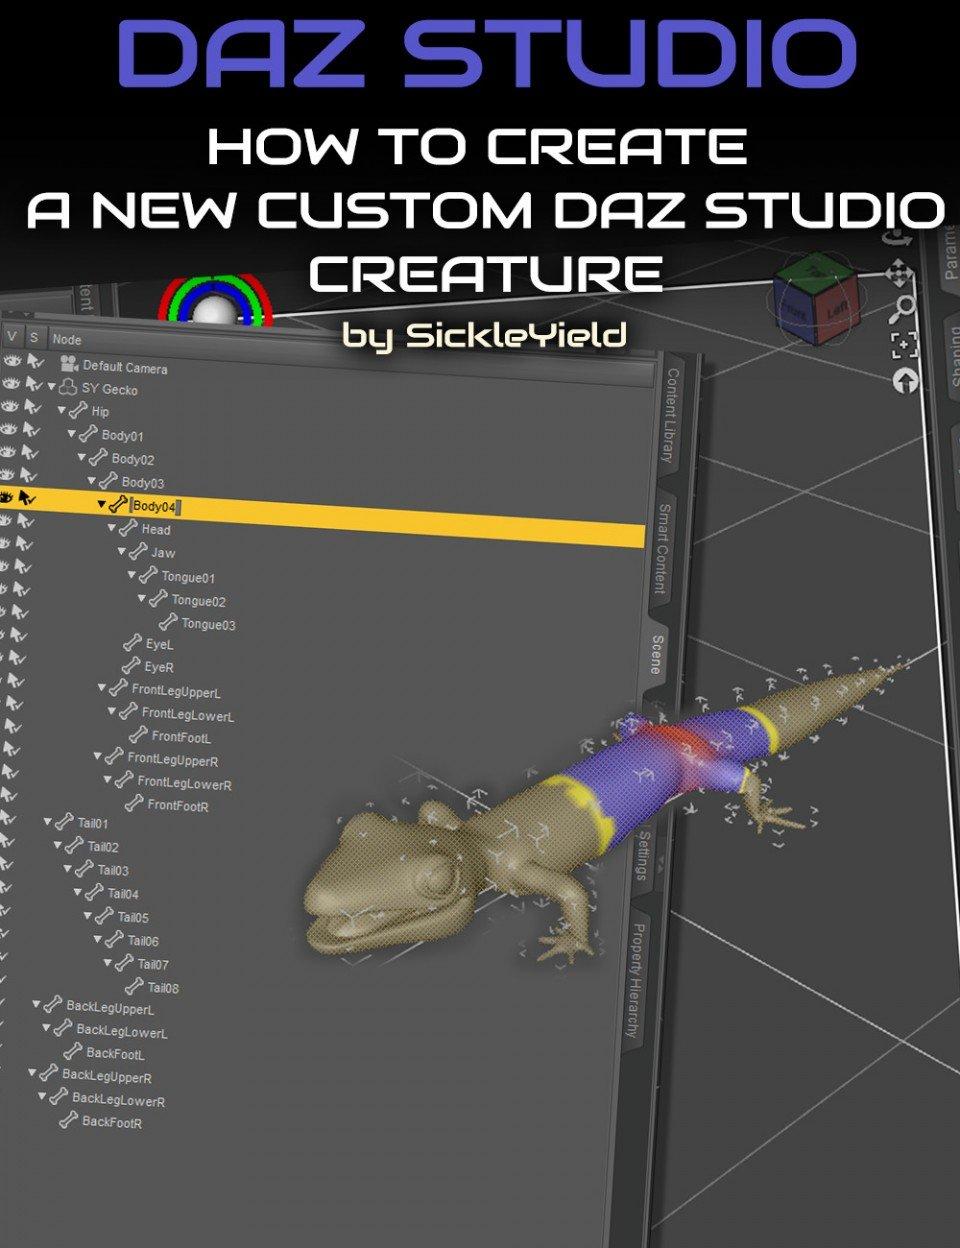 How to Create a New Daz Studio Custom Creature_DAZ3D下载站